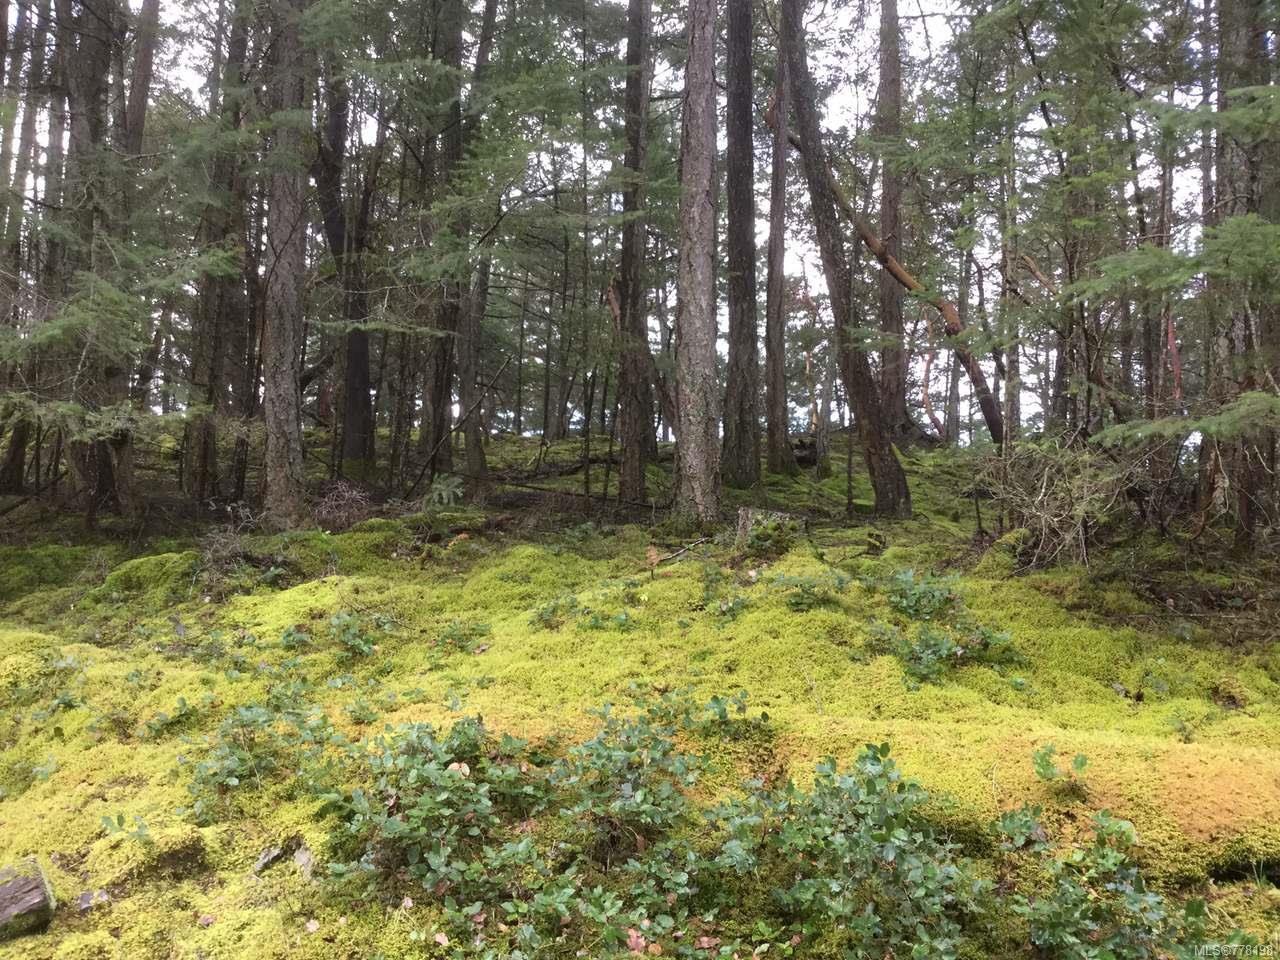 Main Photo: 155 Sockeye Dr in MUDGE ISLAND: Isl Mudge Island Land for sale (Islands)  : MLS®# 778198